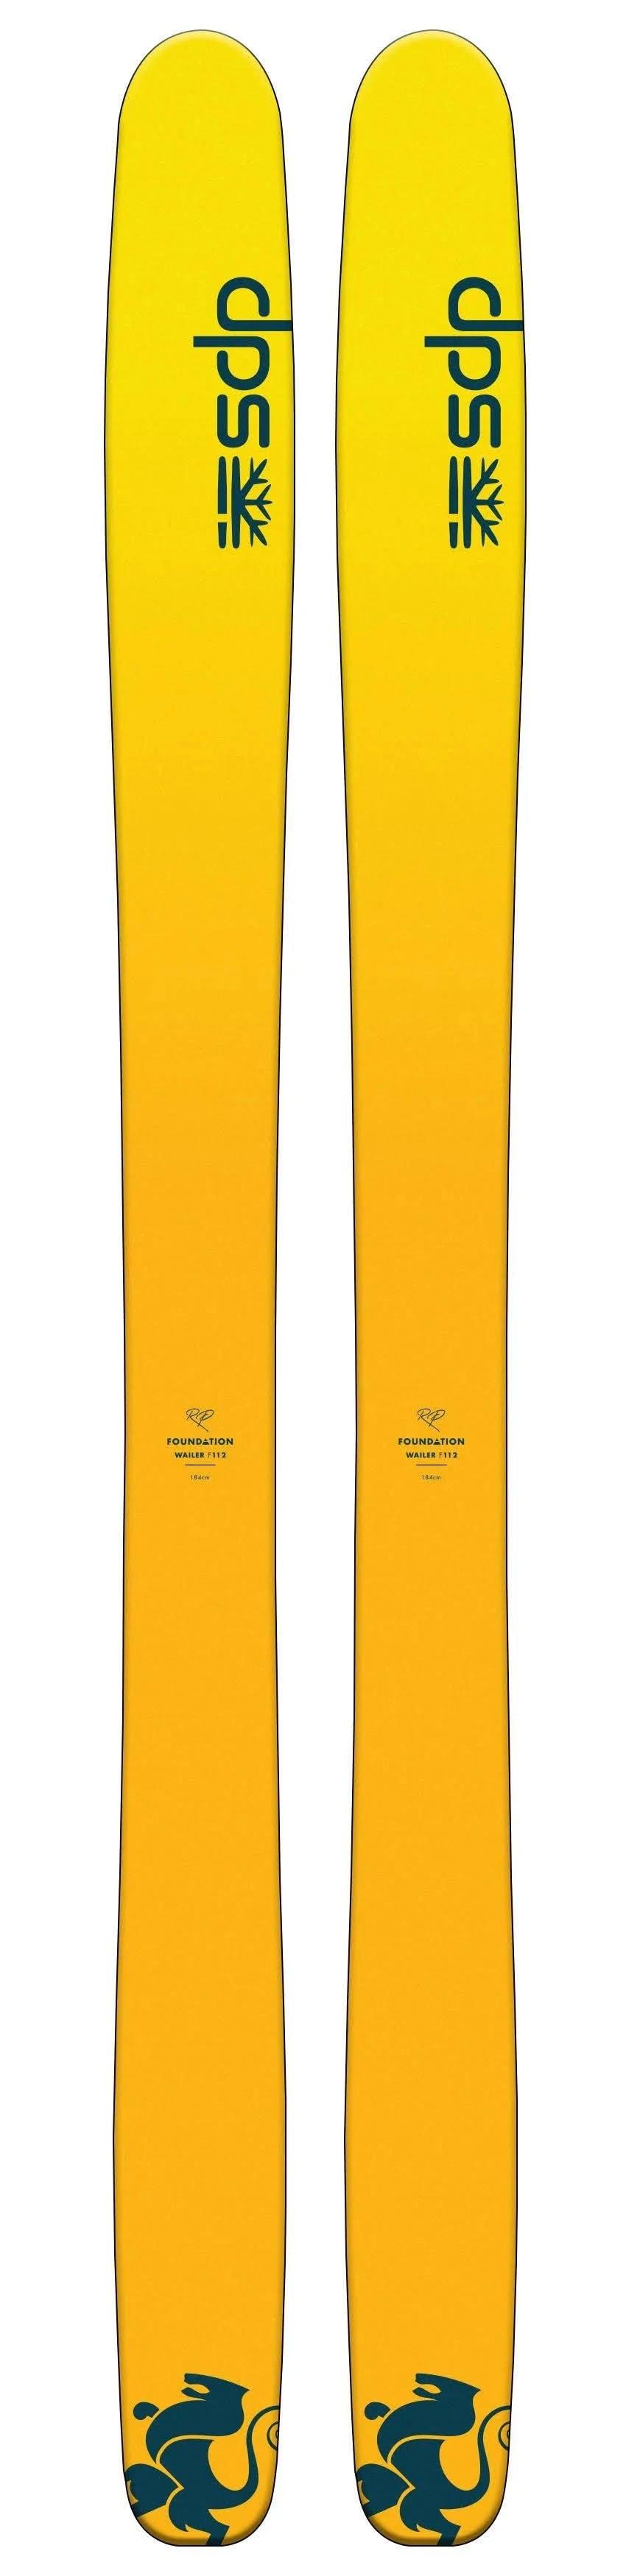 DPS Wailer F112 RP Skis · 2021